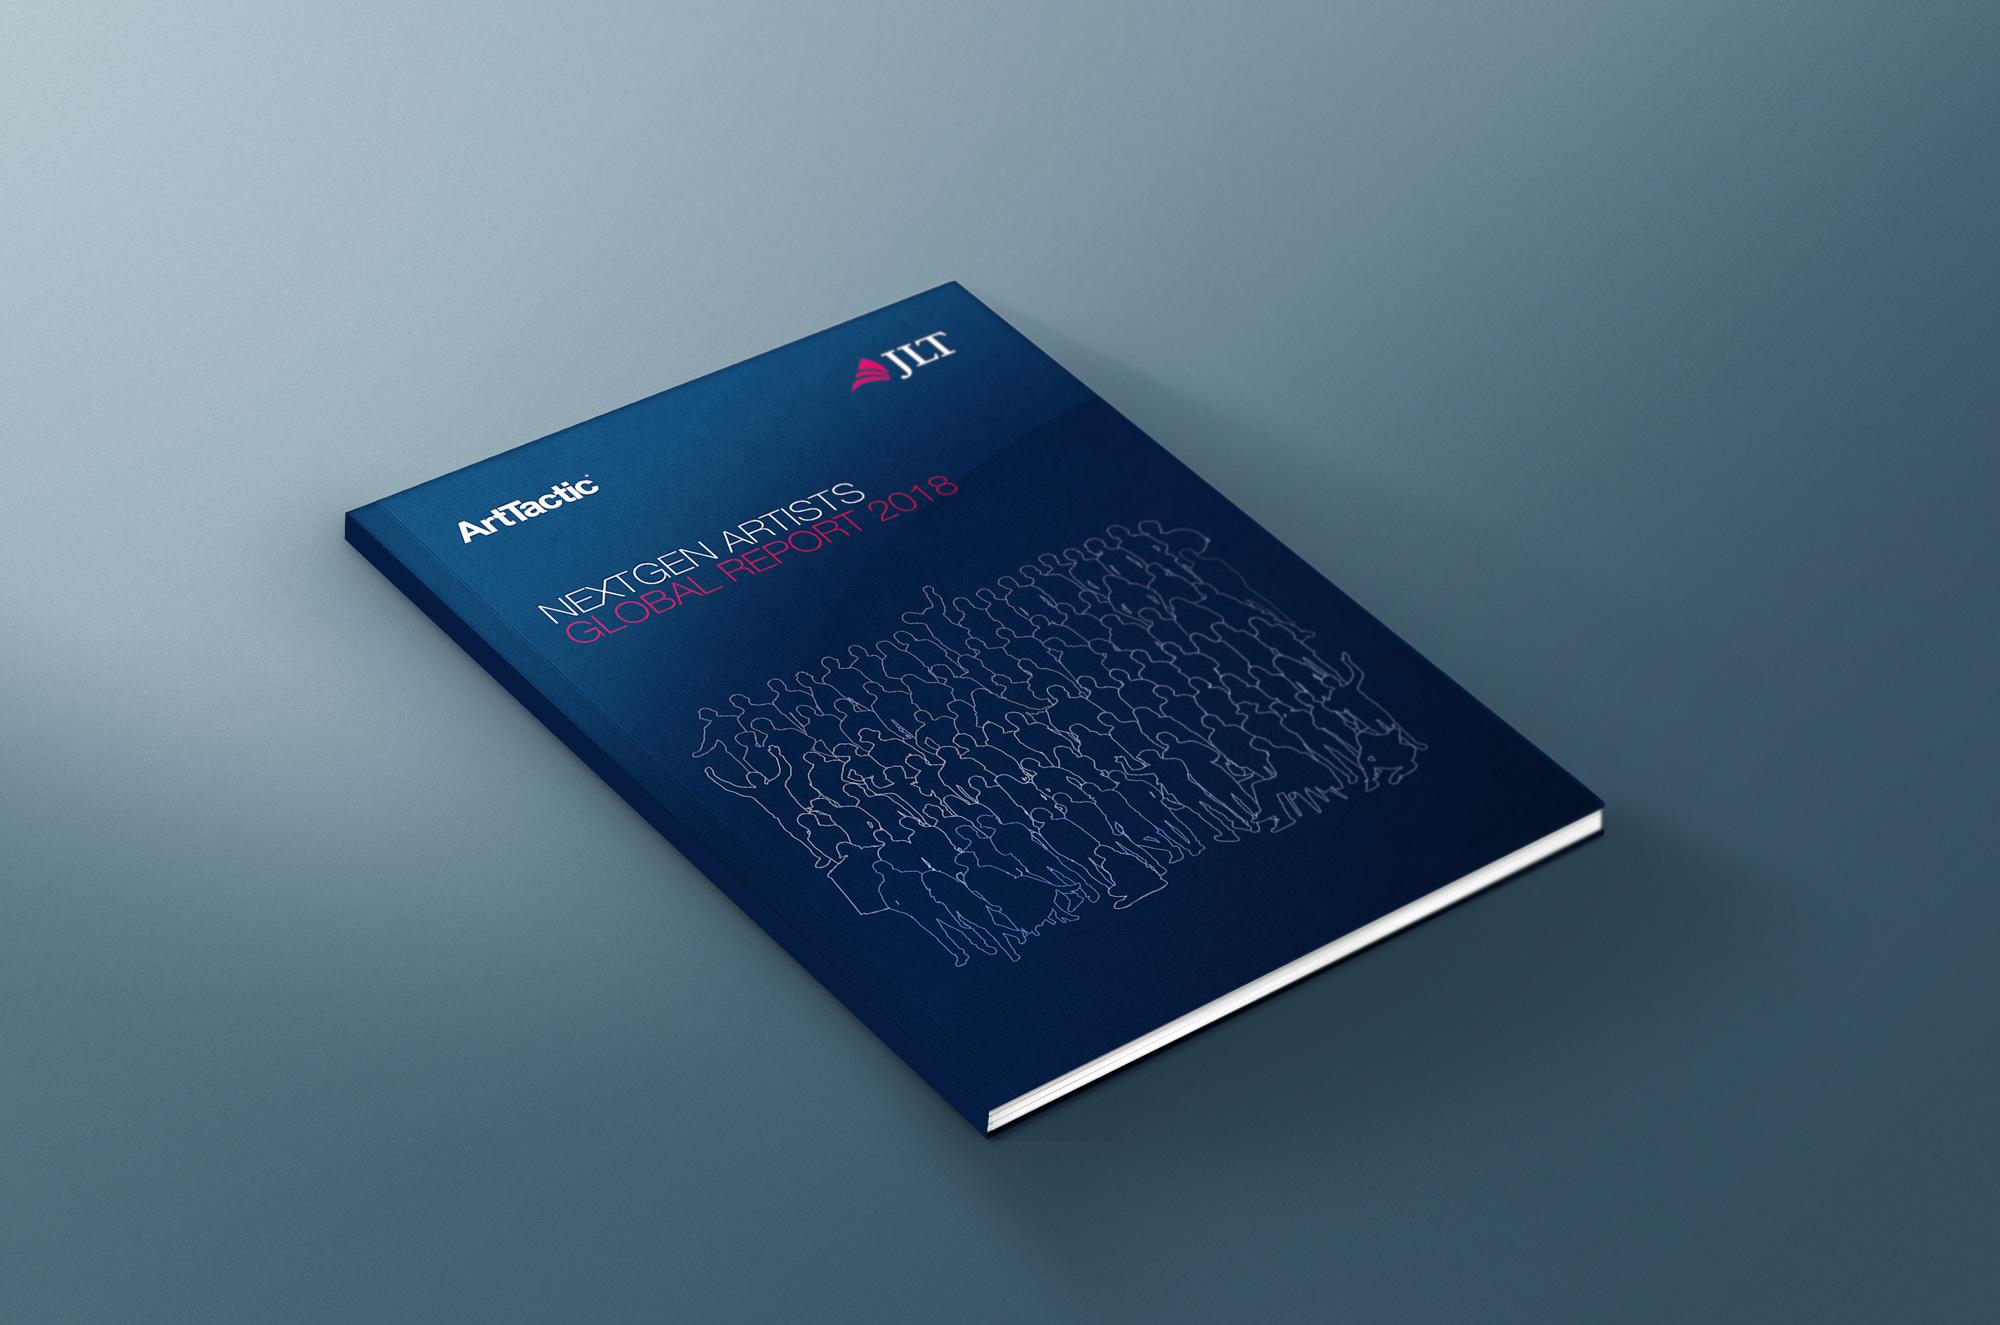 NextGen Artists Global Report designed by Elsie Lam